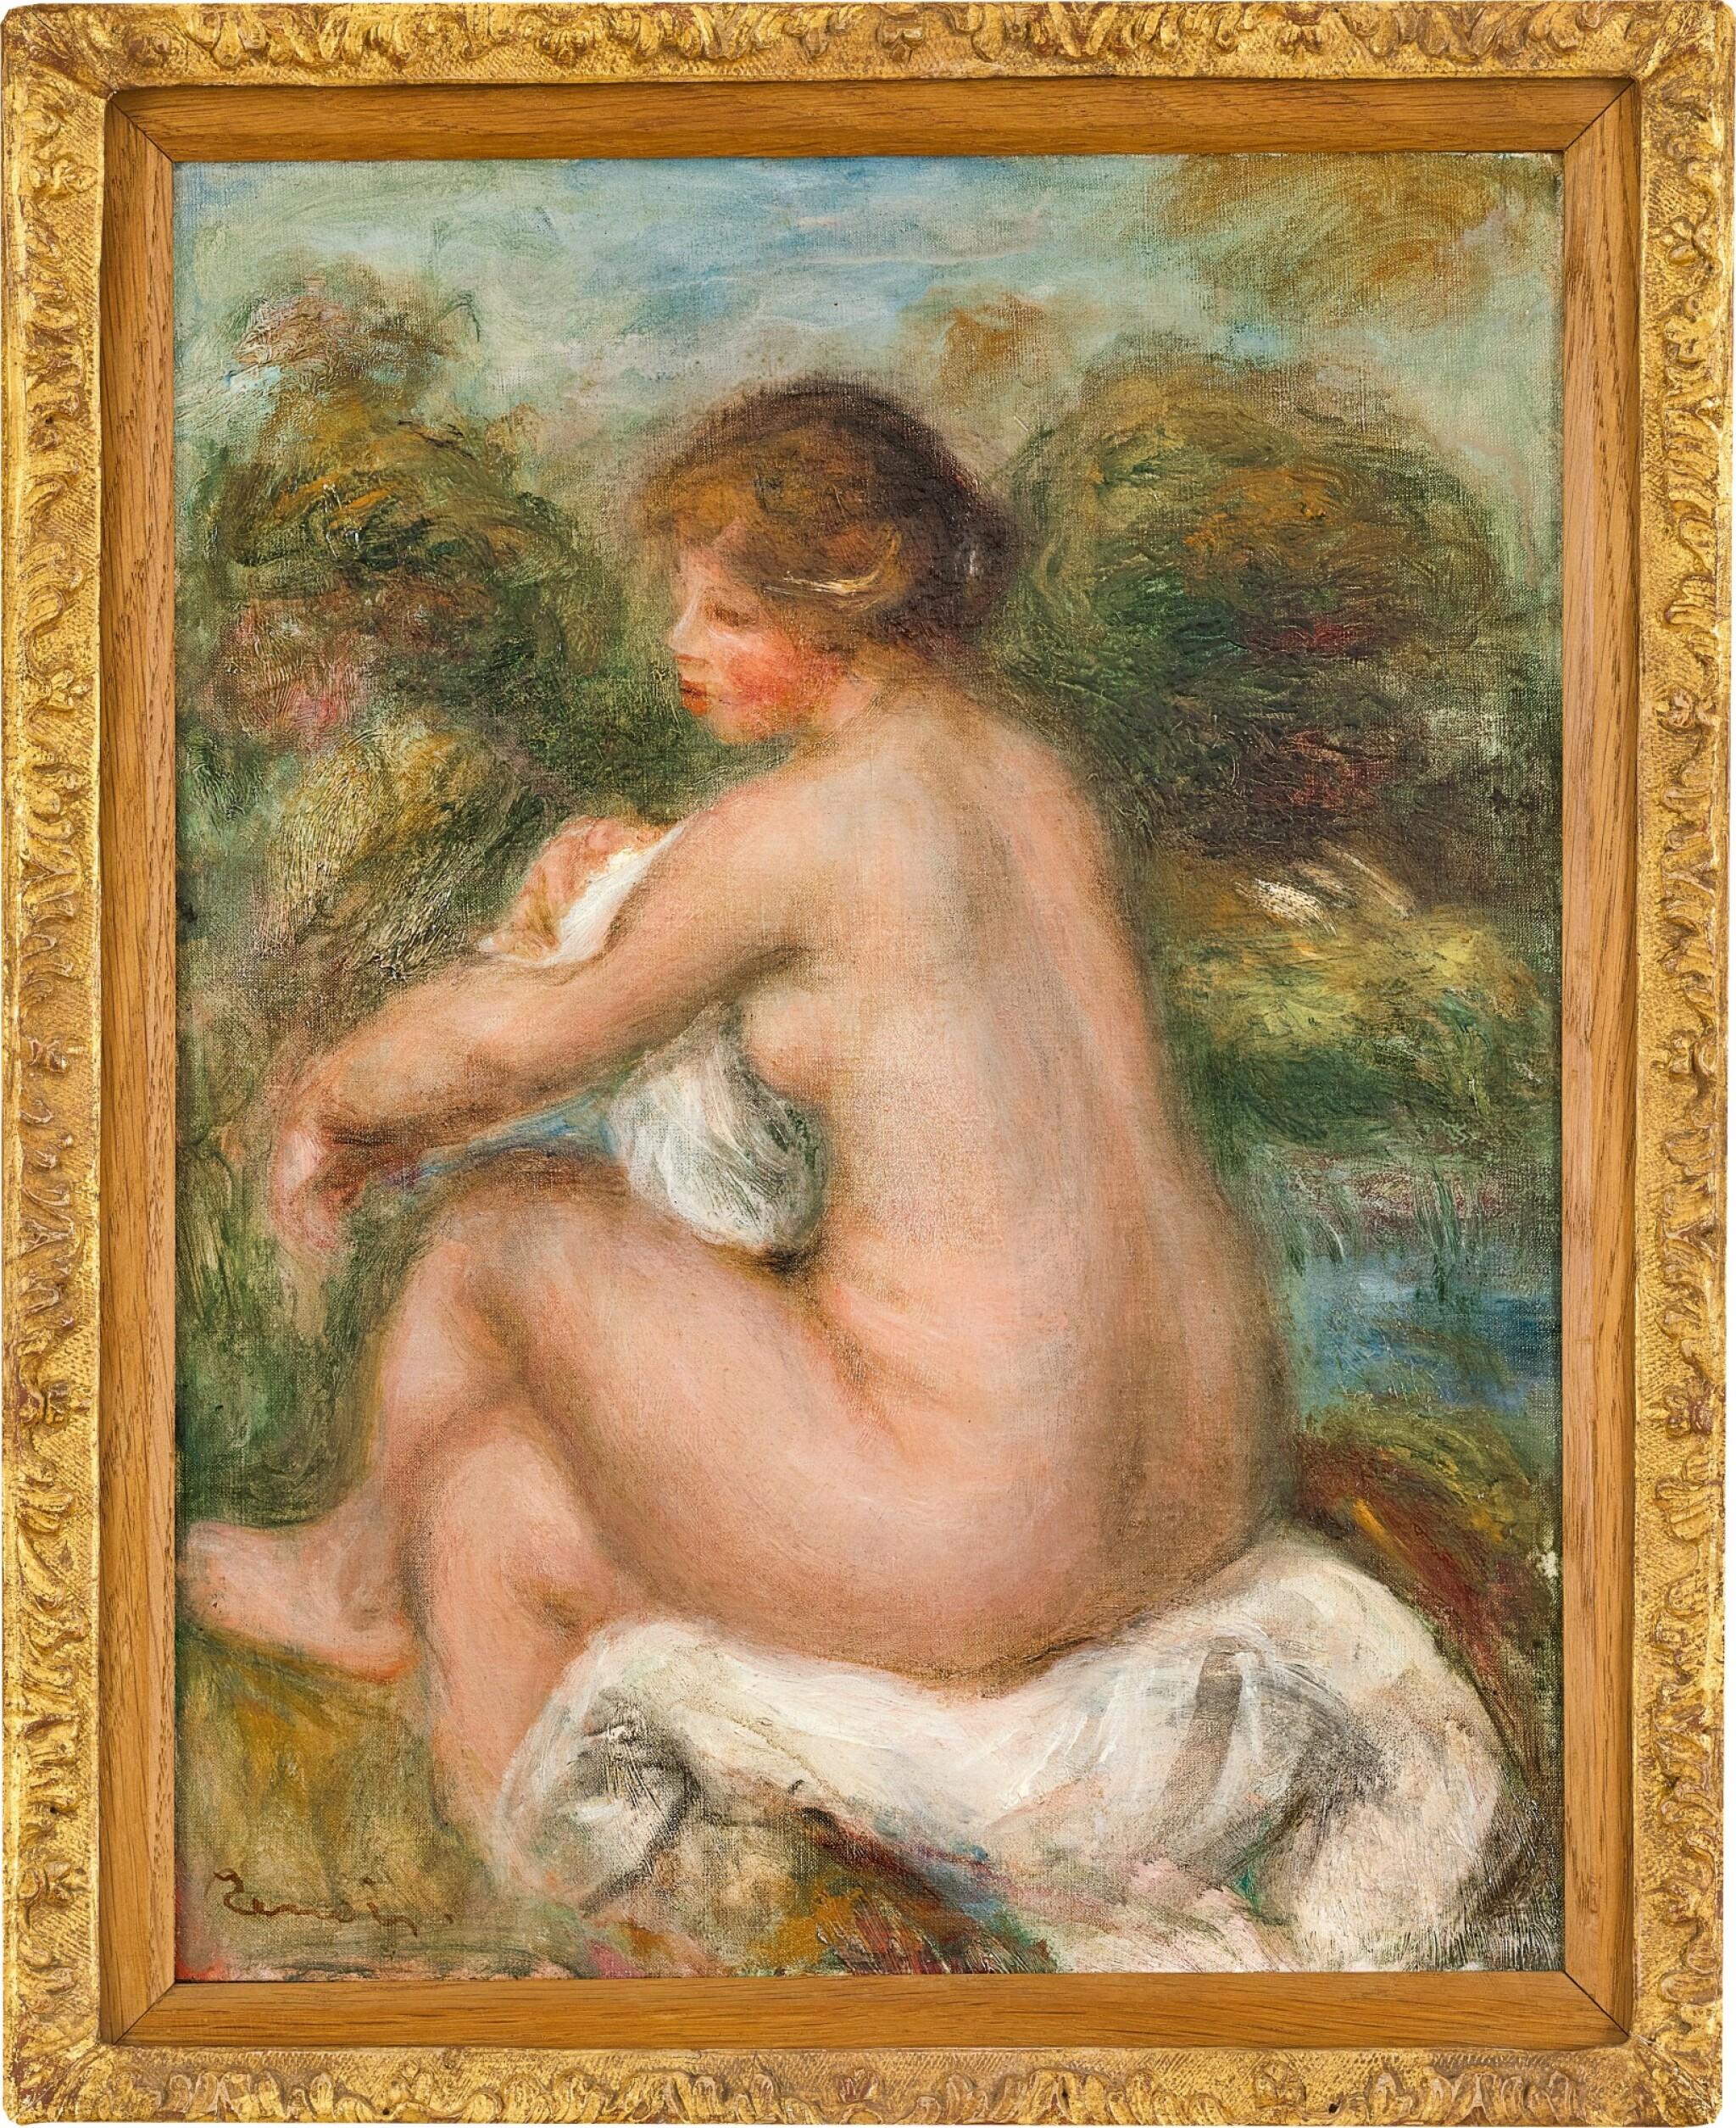 View full screen - View 1 of Lot 1042. Pierre-Auguste Renoir 皮耶・奧古斯特・雷諾瓦 | La Baigneuse assise 沐浴的少女.